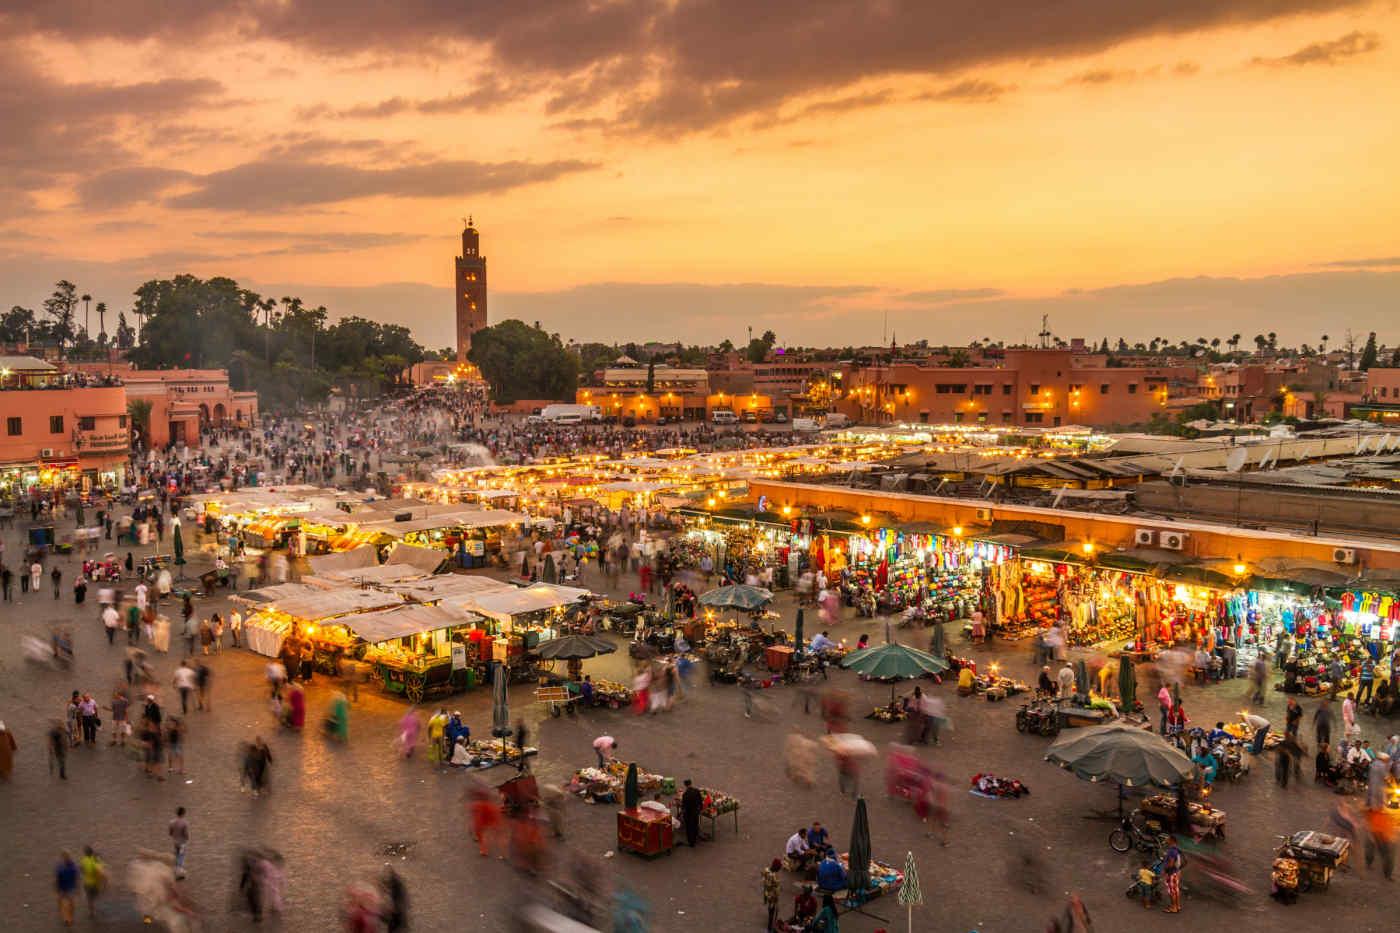 Jemaa-El-Fna Market